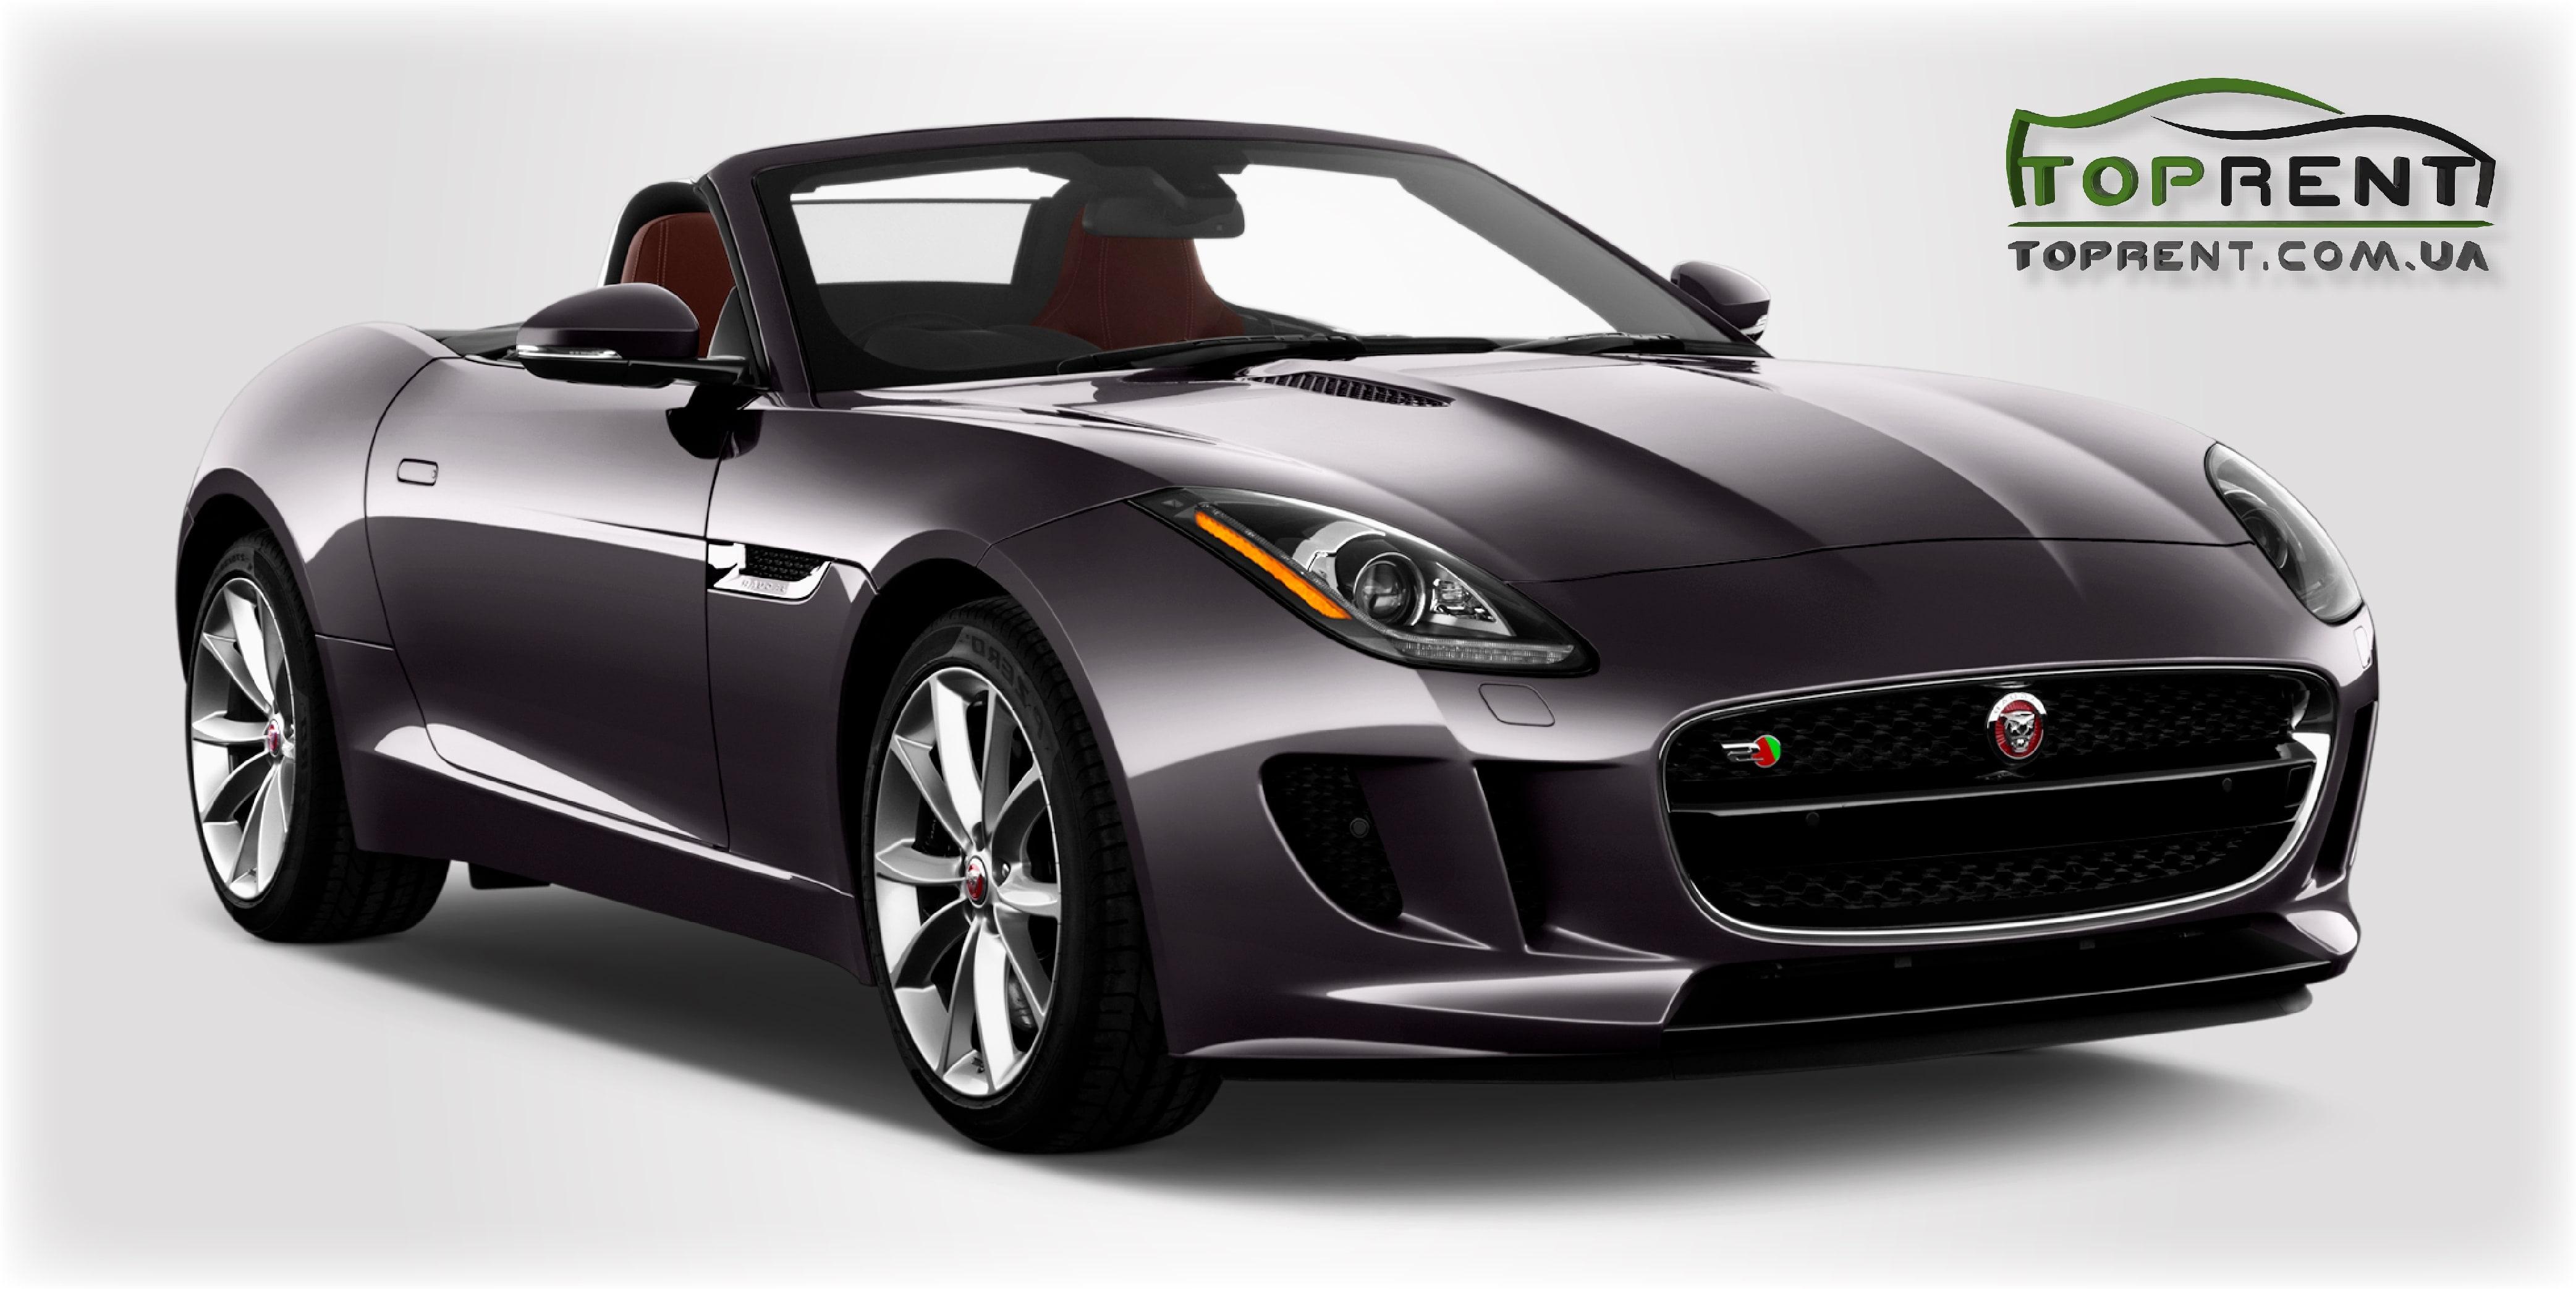 Прокат и аренда авто Jaguar F-Type V6 S Cabrio - фото 1 | TOPrent.com.ua